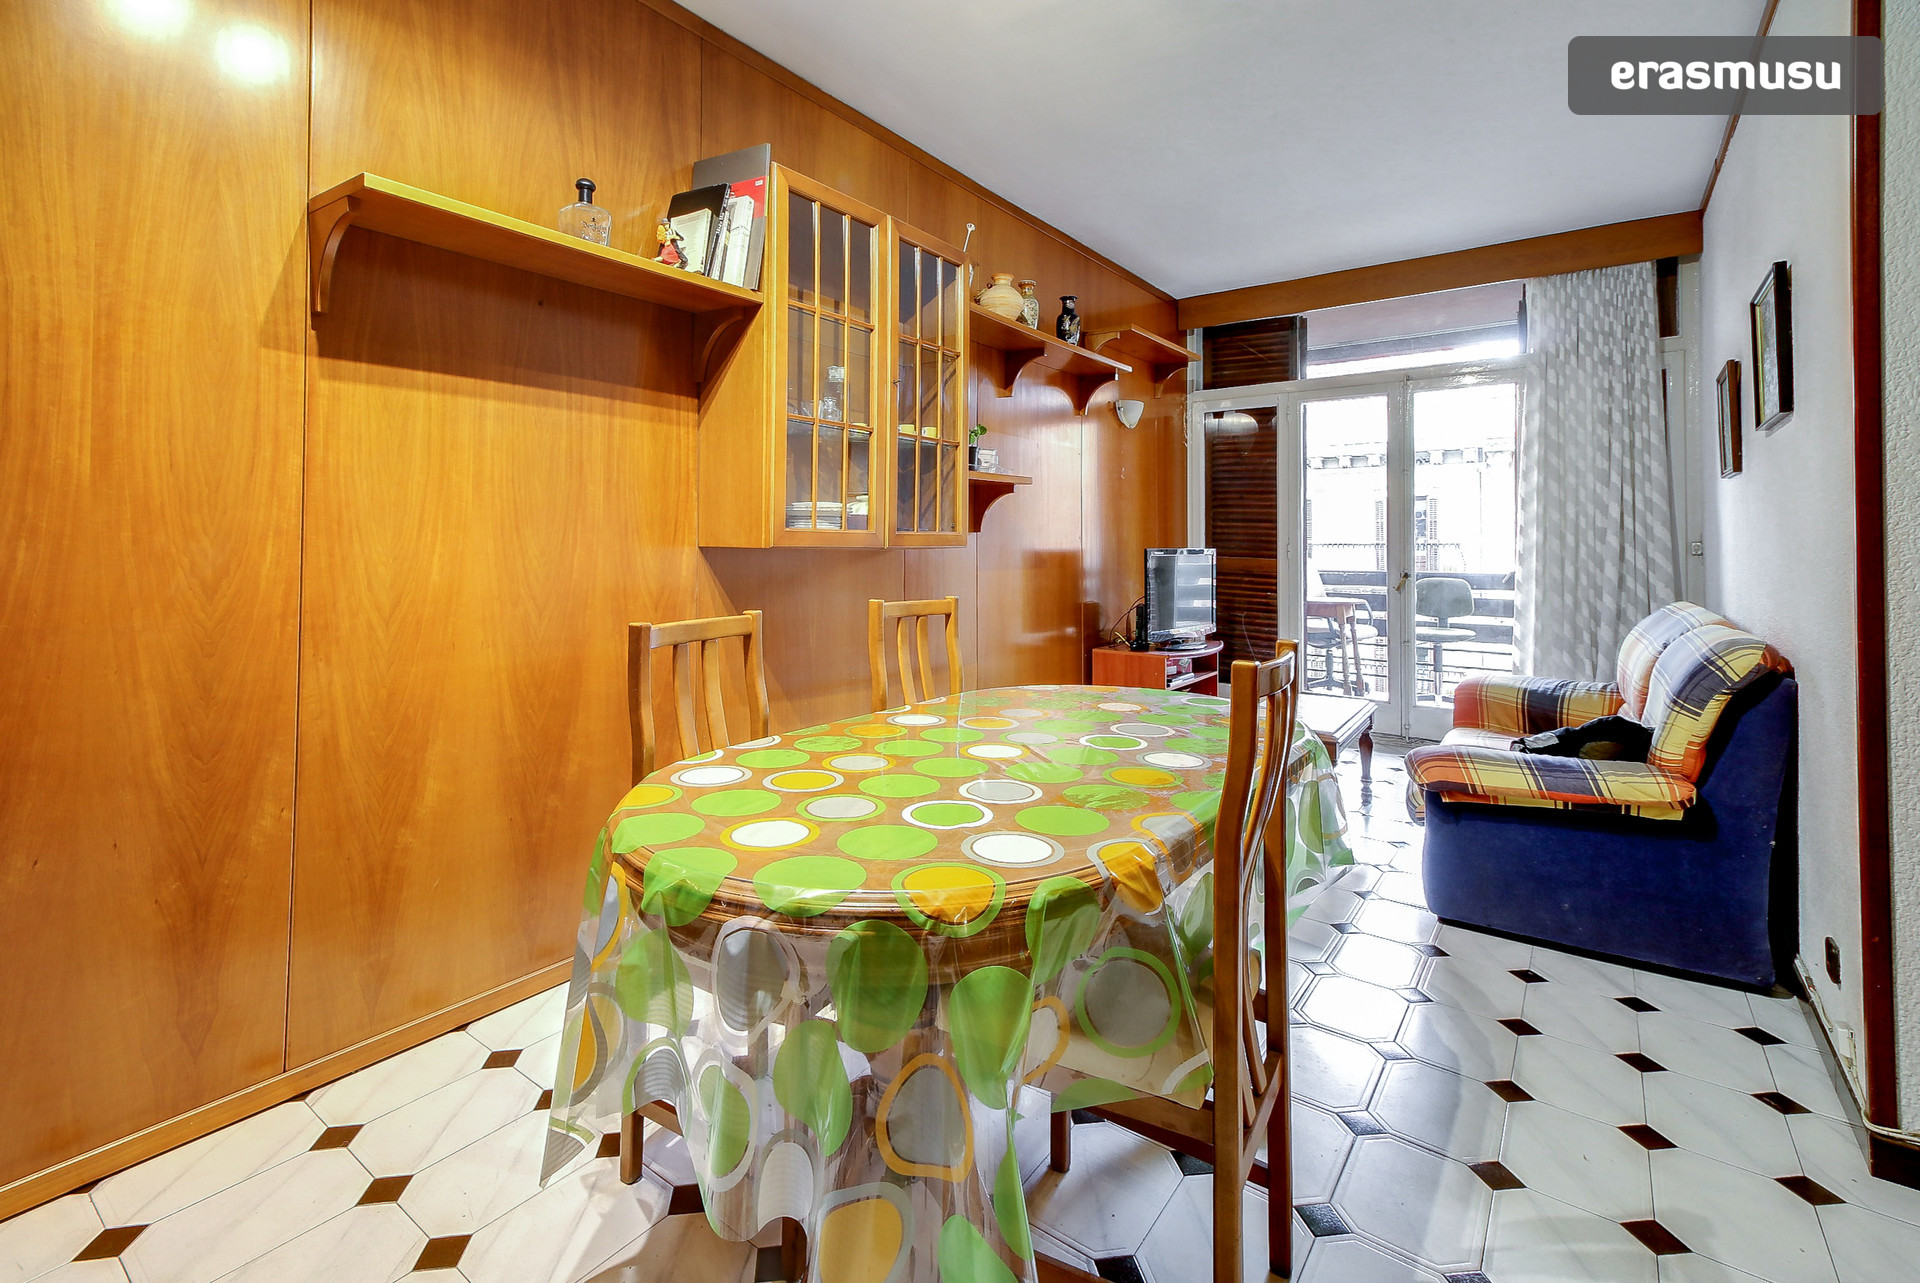 habitacion-chollo-barcelona-9e832492363a